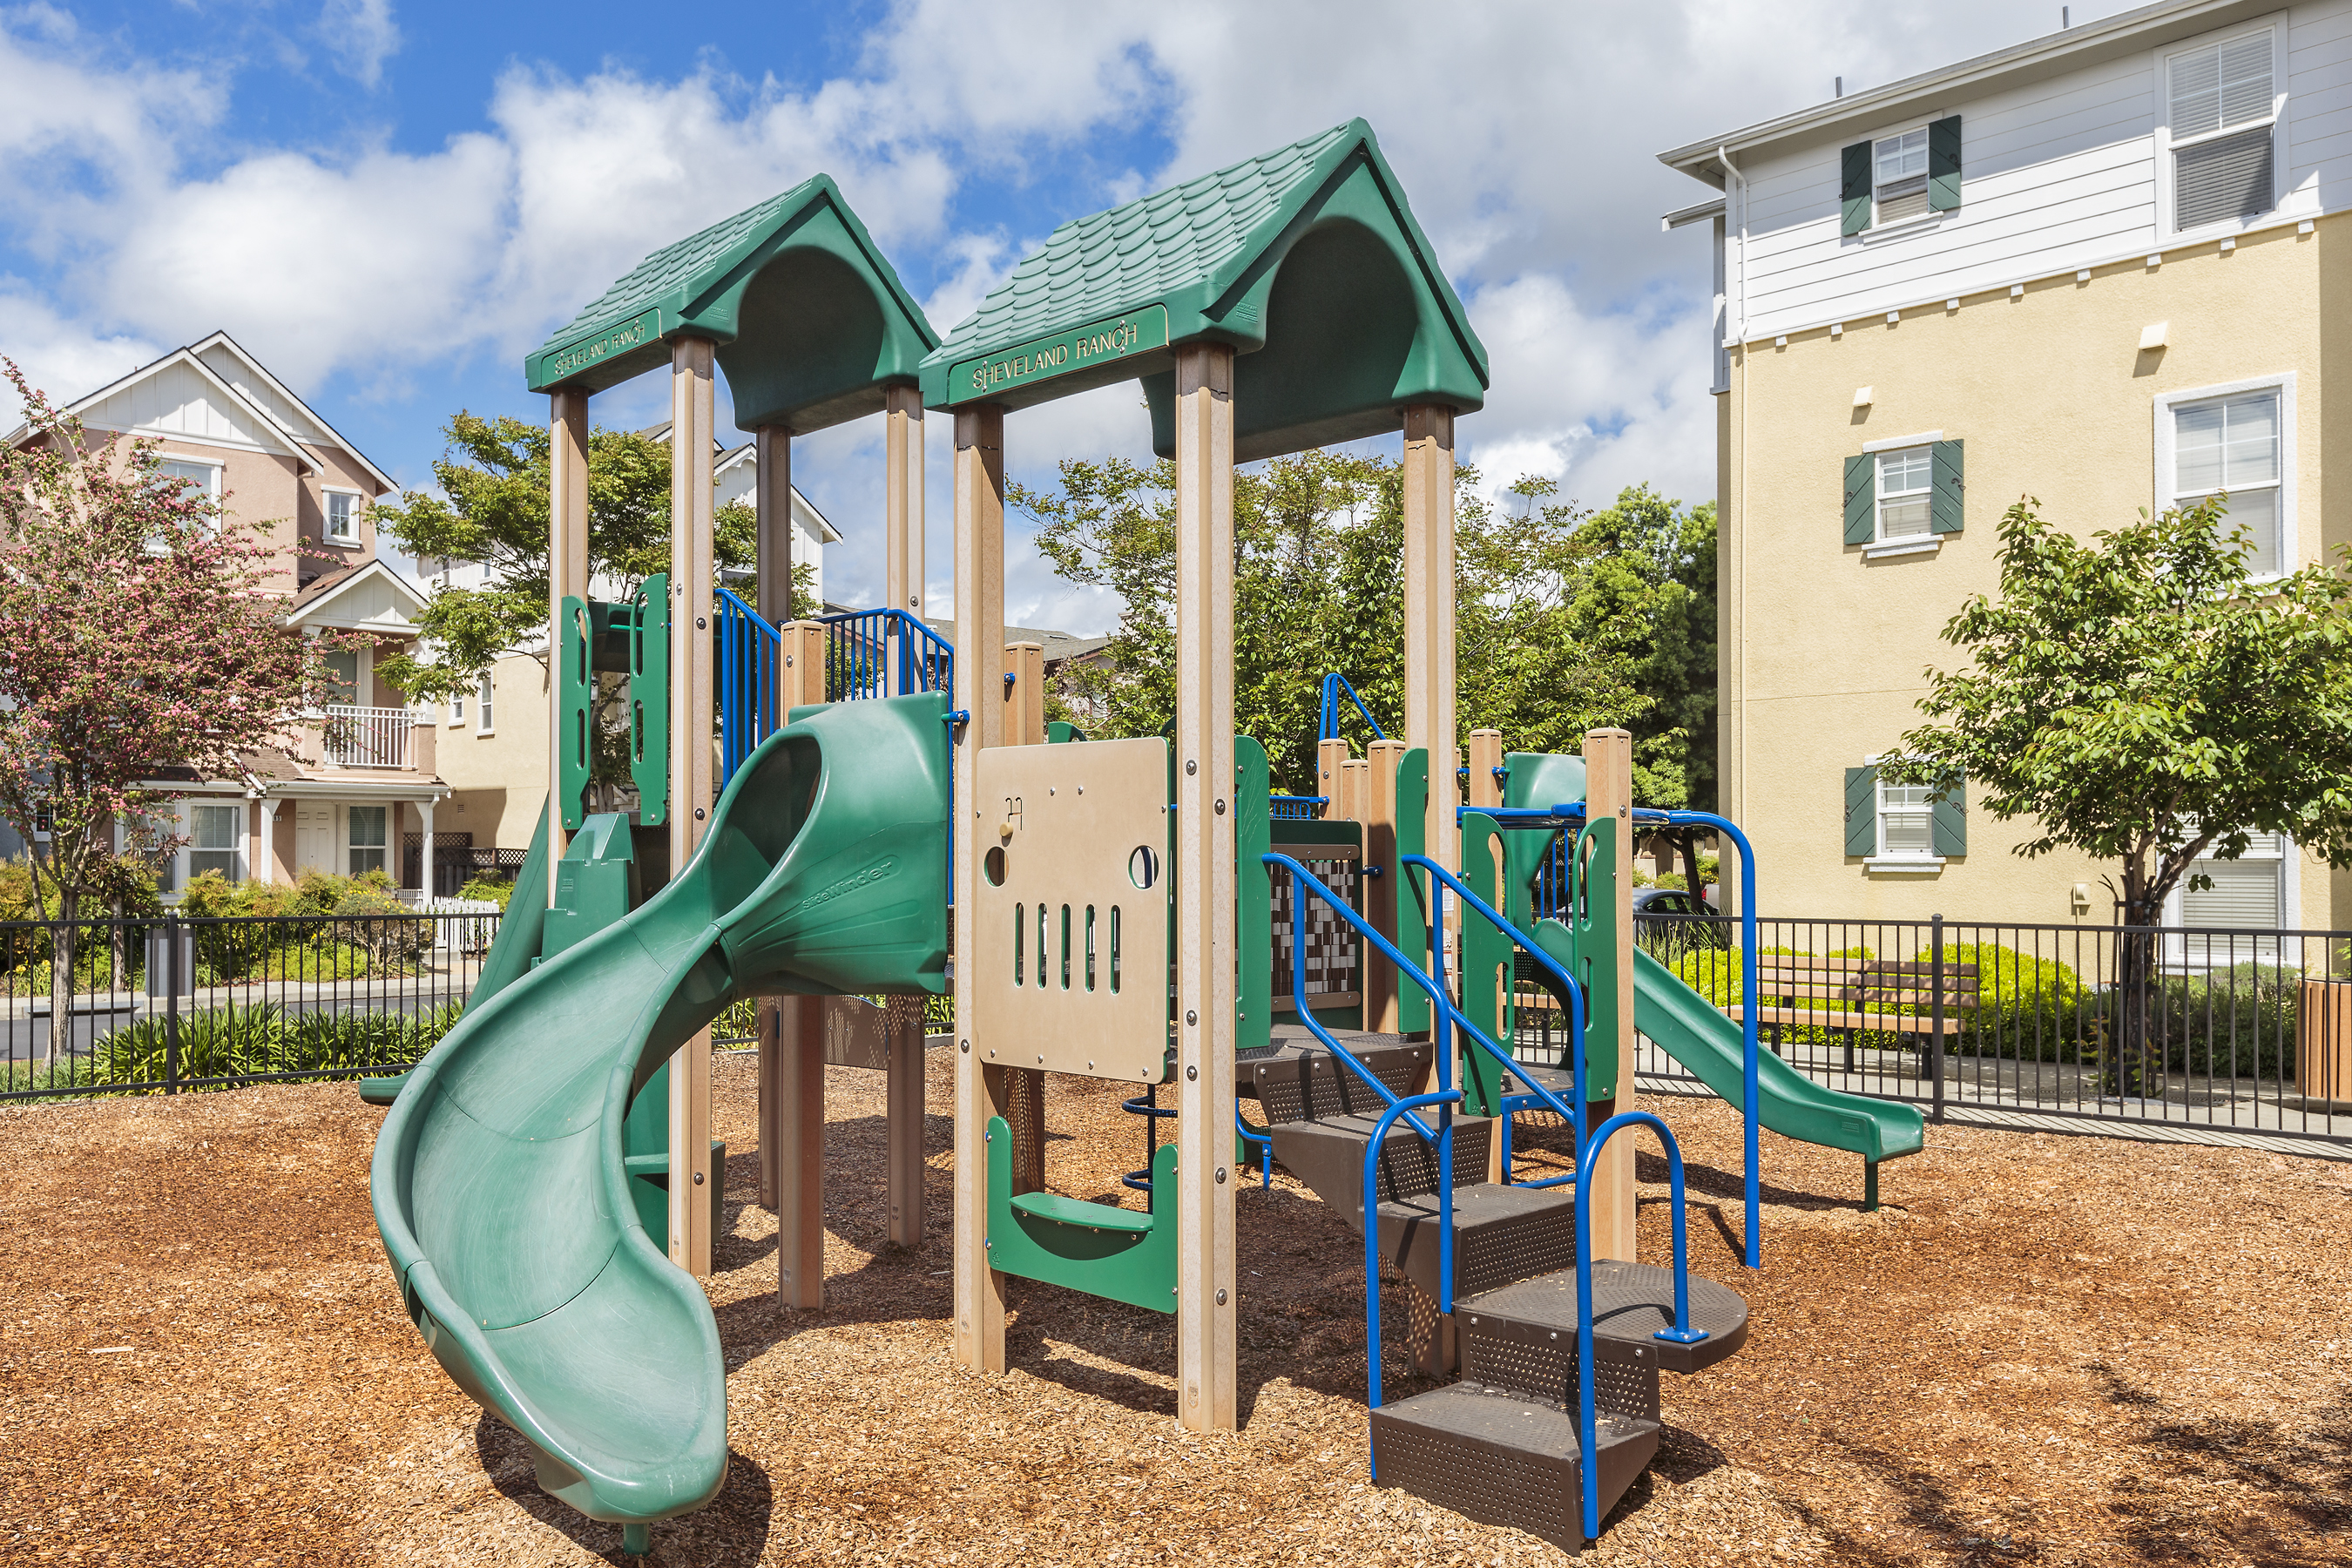 18-2225-Sea-Hero-playground-high-res